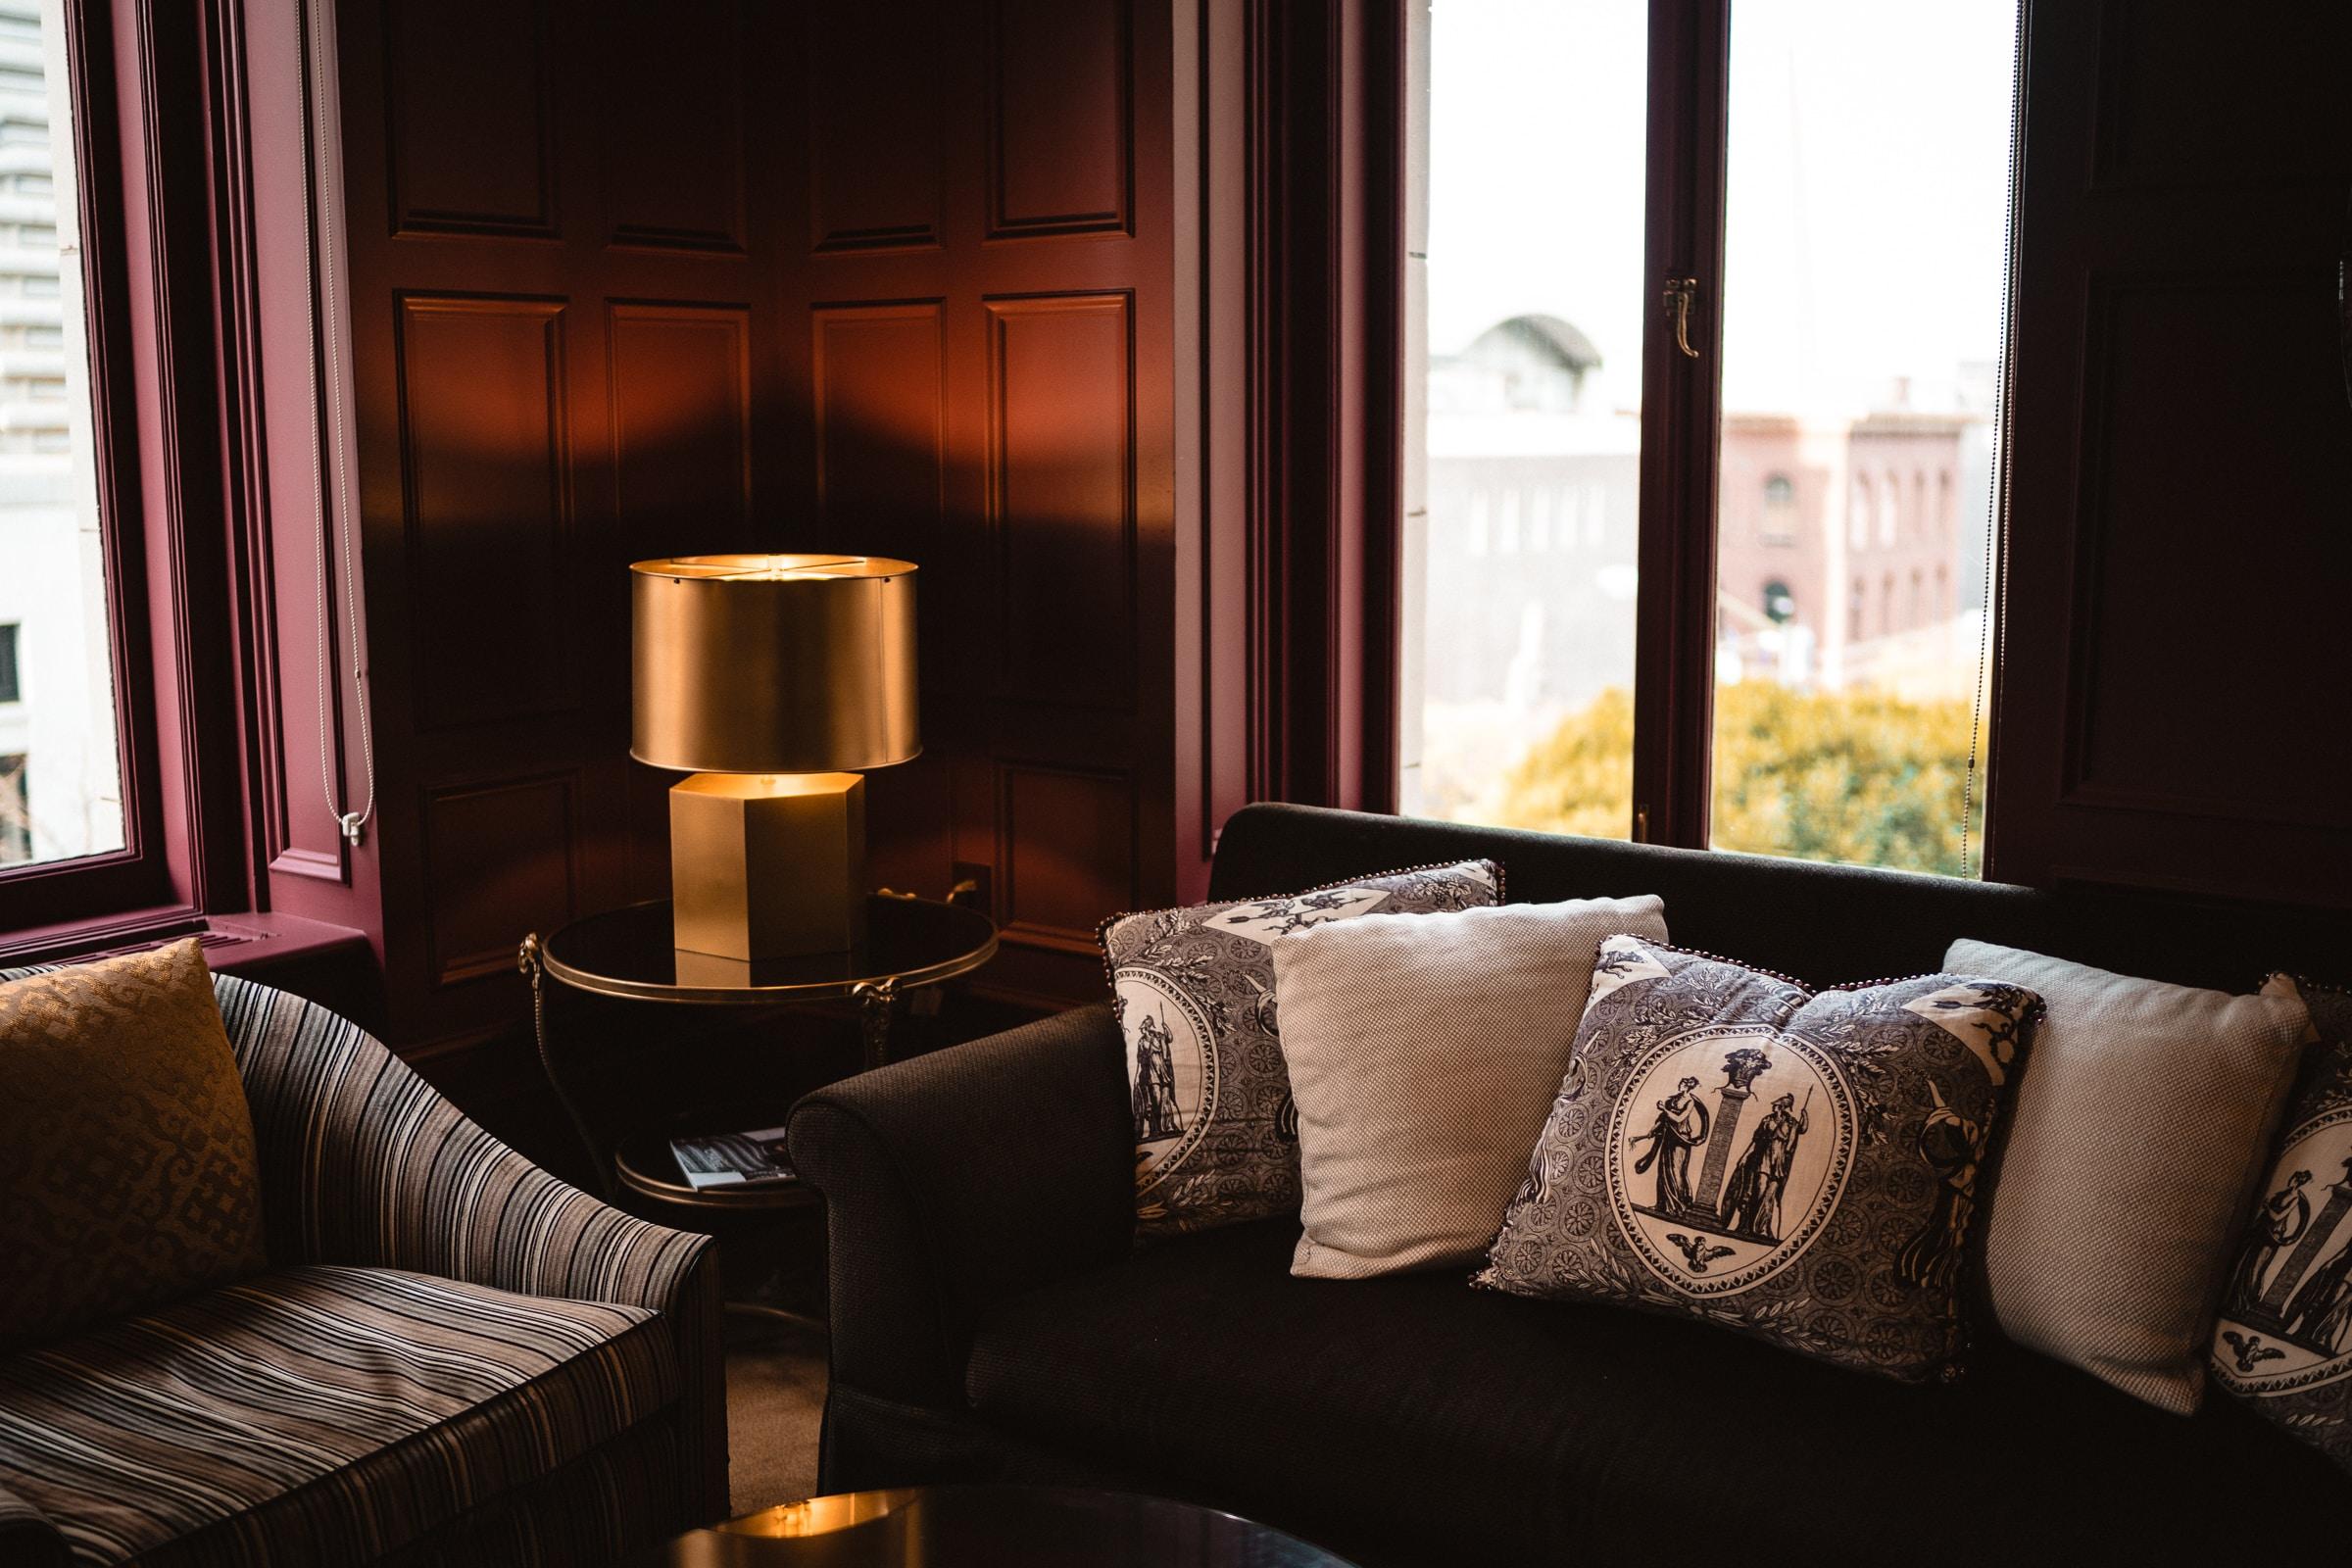 home decor trends 2018 jewel tones